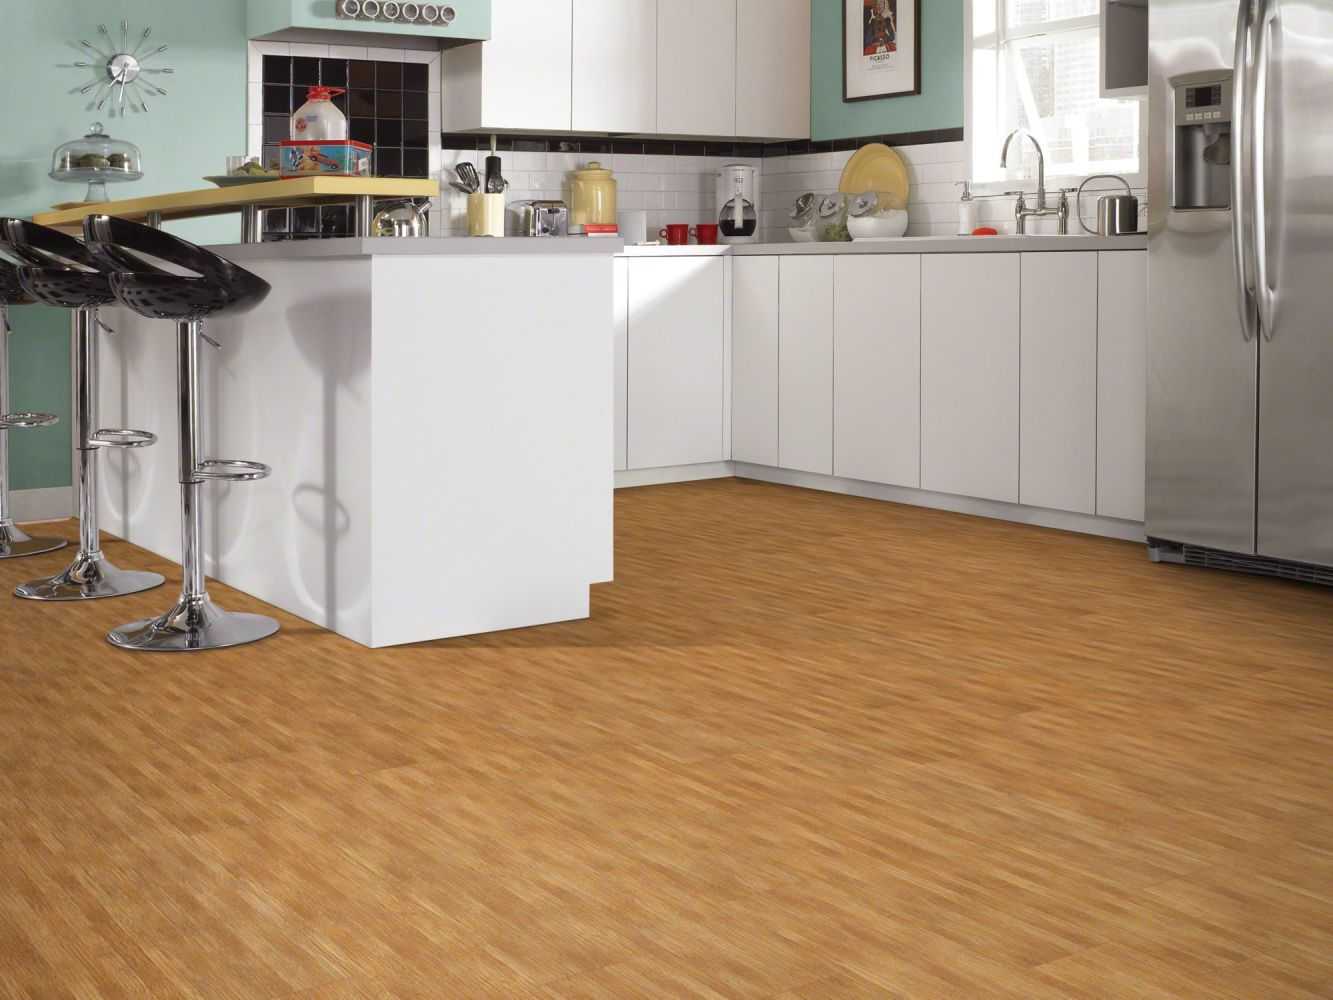 Shaw Floors Resilient Residential Urbanality 20 P Bridgeway 00768_0330V